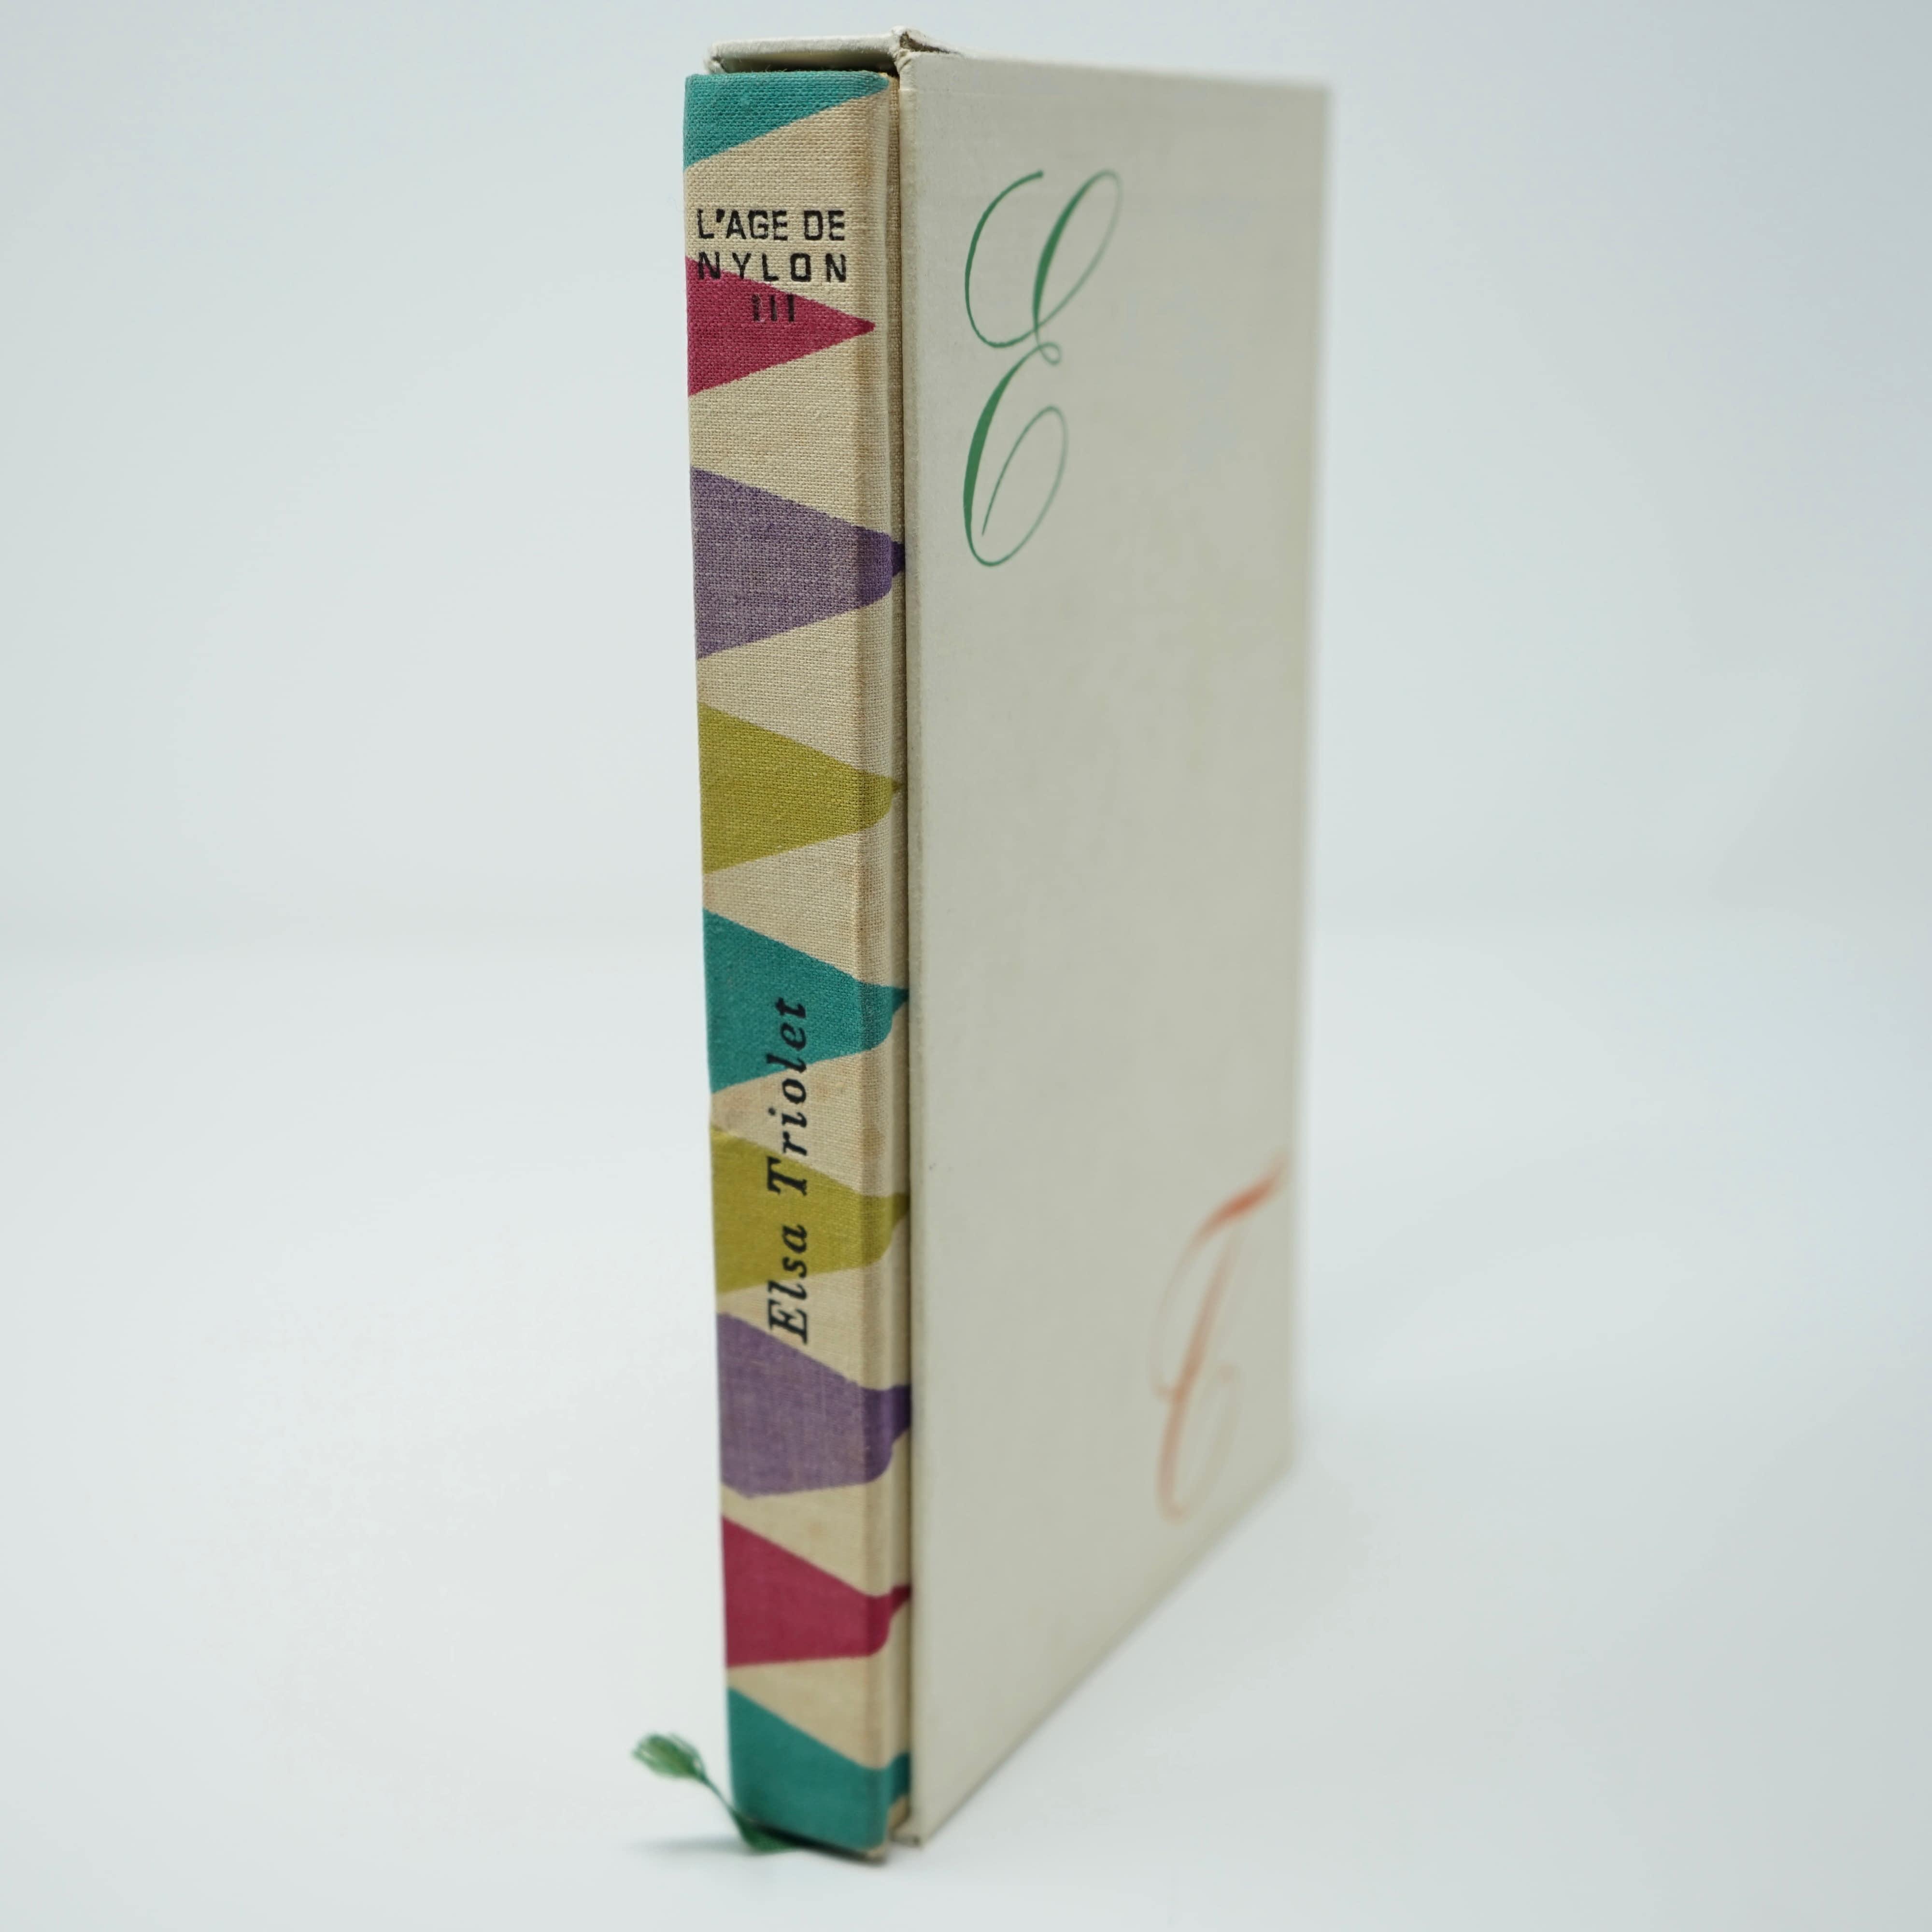 Livre L'Age de Nylon III L'Âme